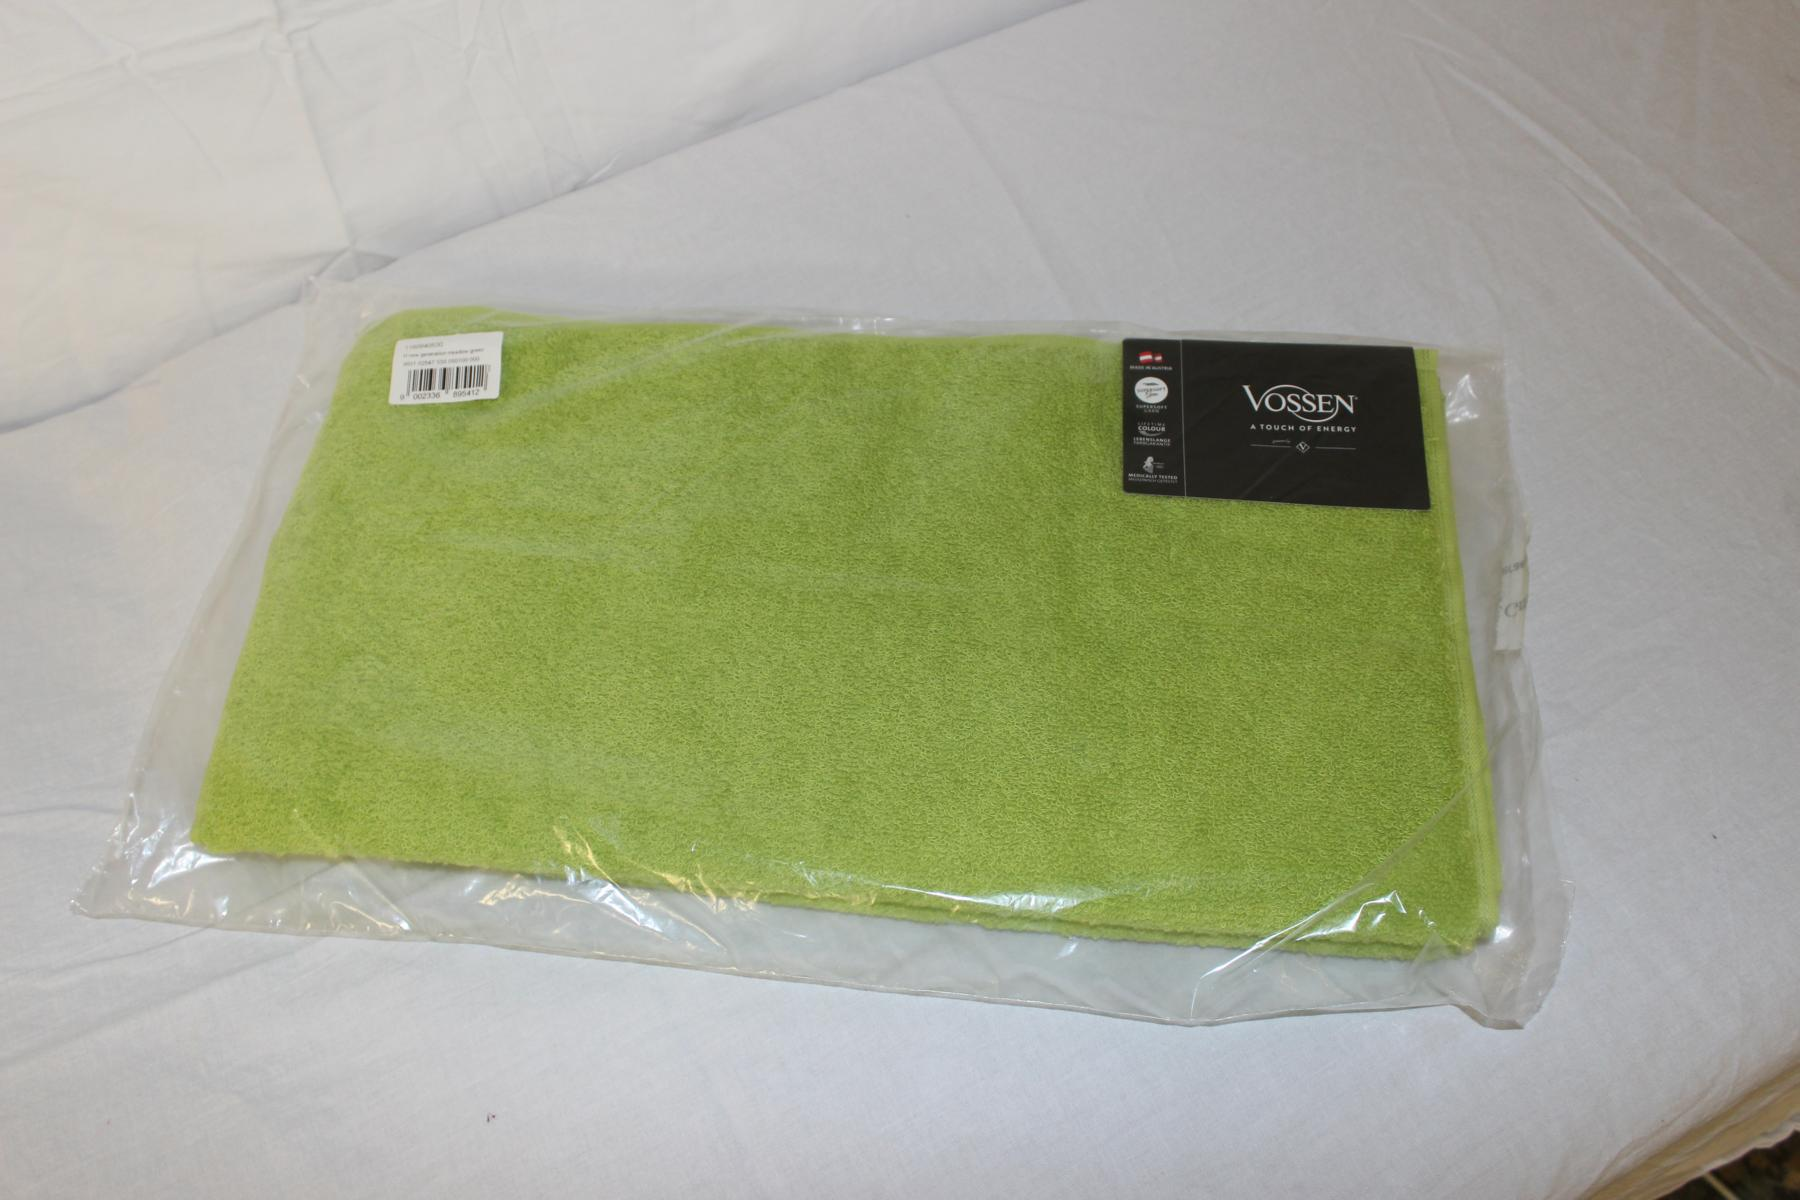 Vossen Handtuch 50 x 100 cm; Farbe: limone 2-er Pack - NEUWARE